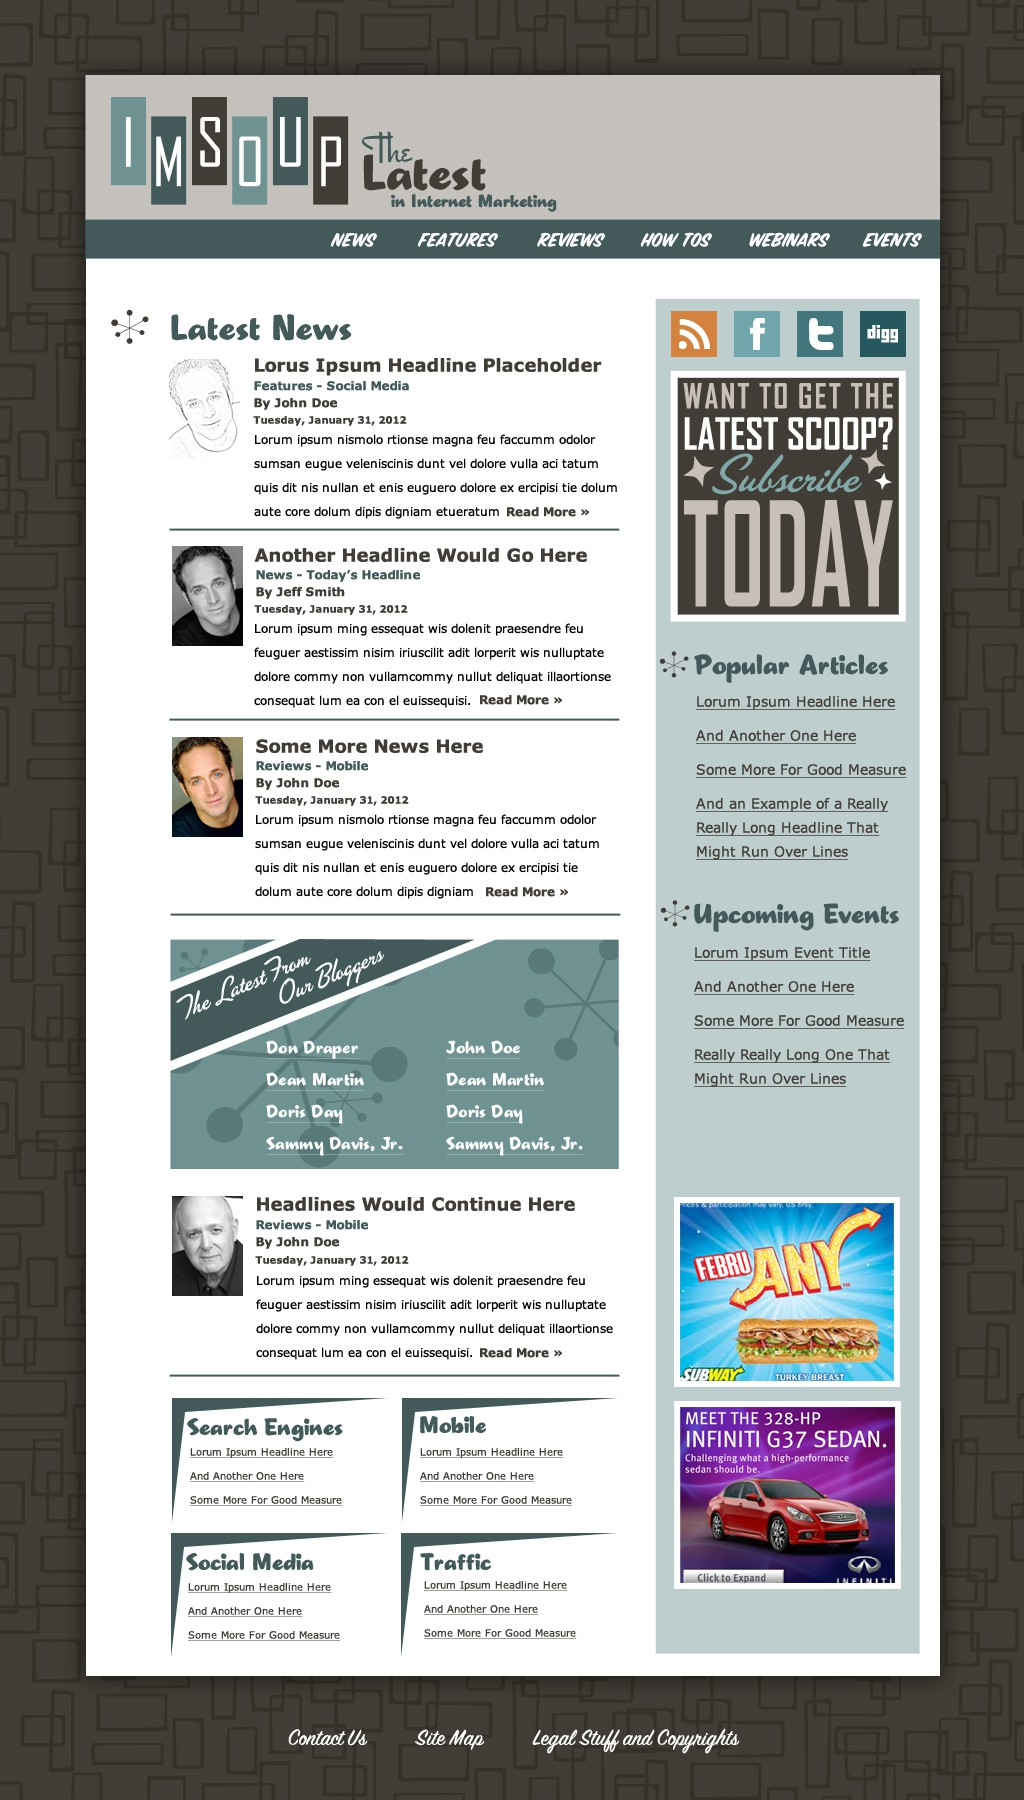 1960's Retro Style Web Design for Internet Marketing News Site